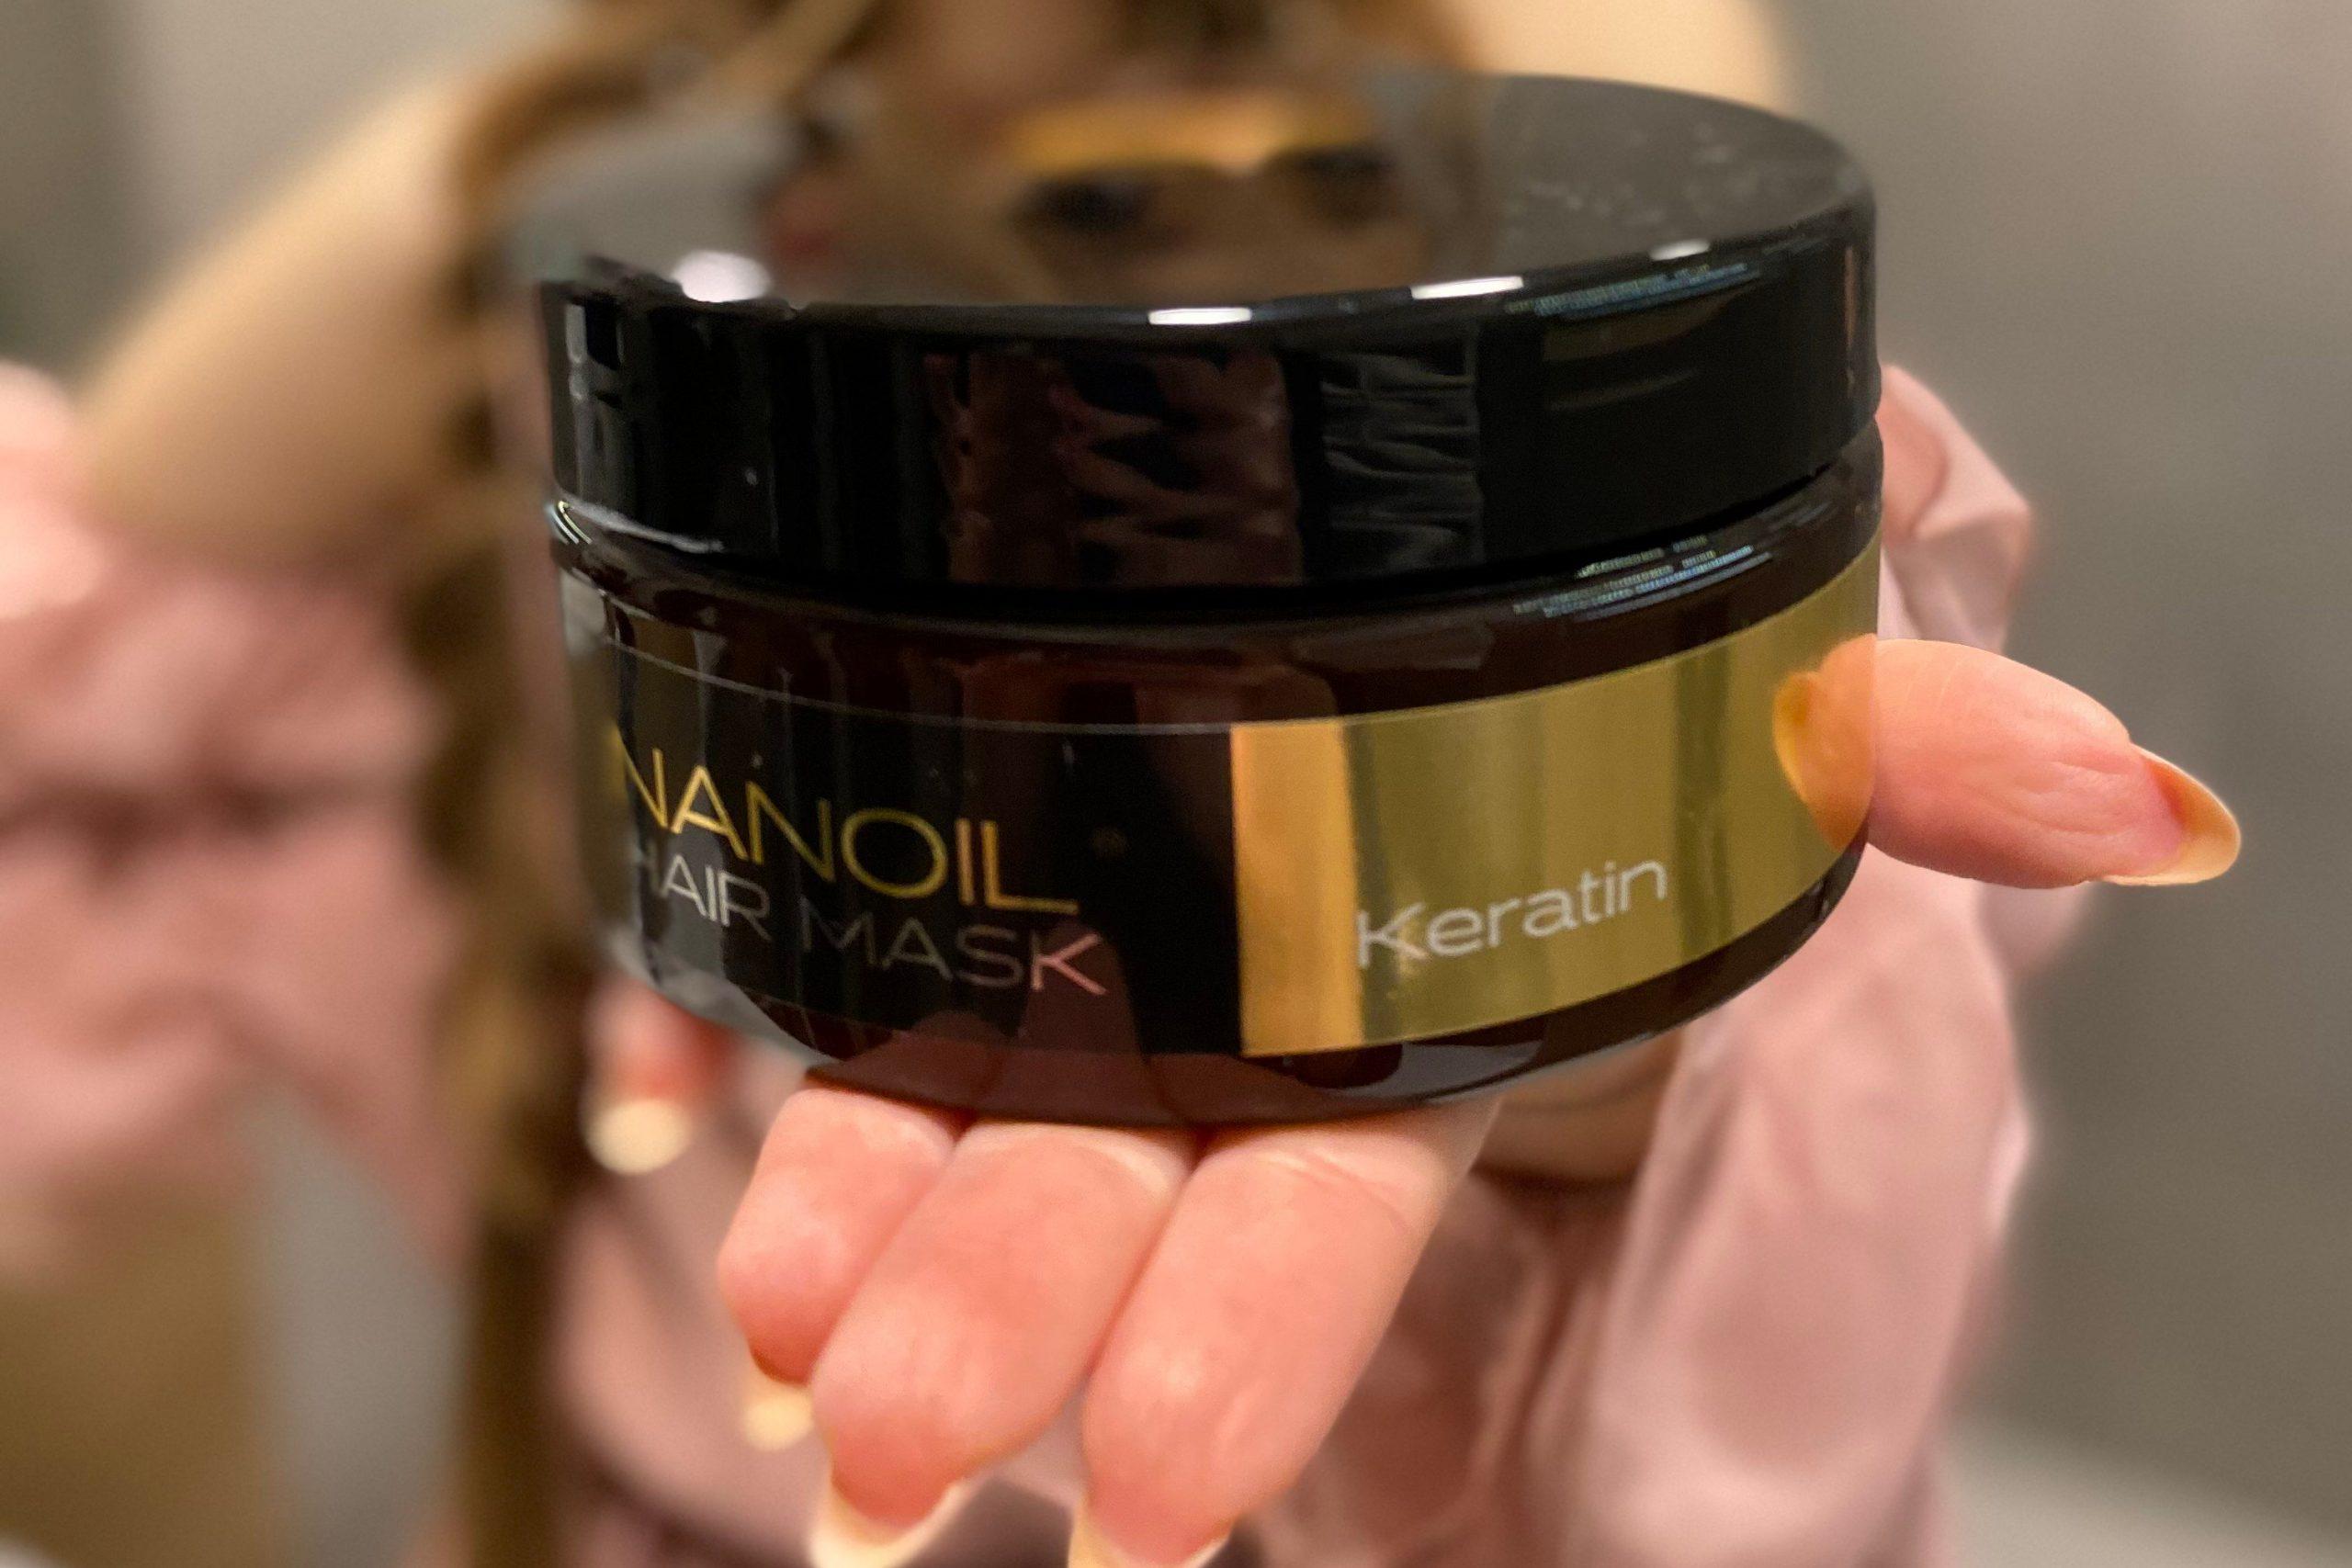 Nanoil a legjobb hajmaszk keratinnal